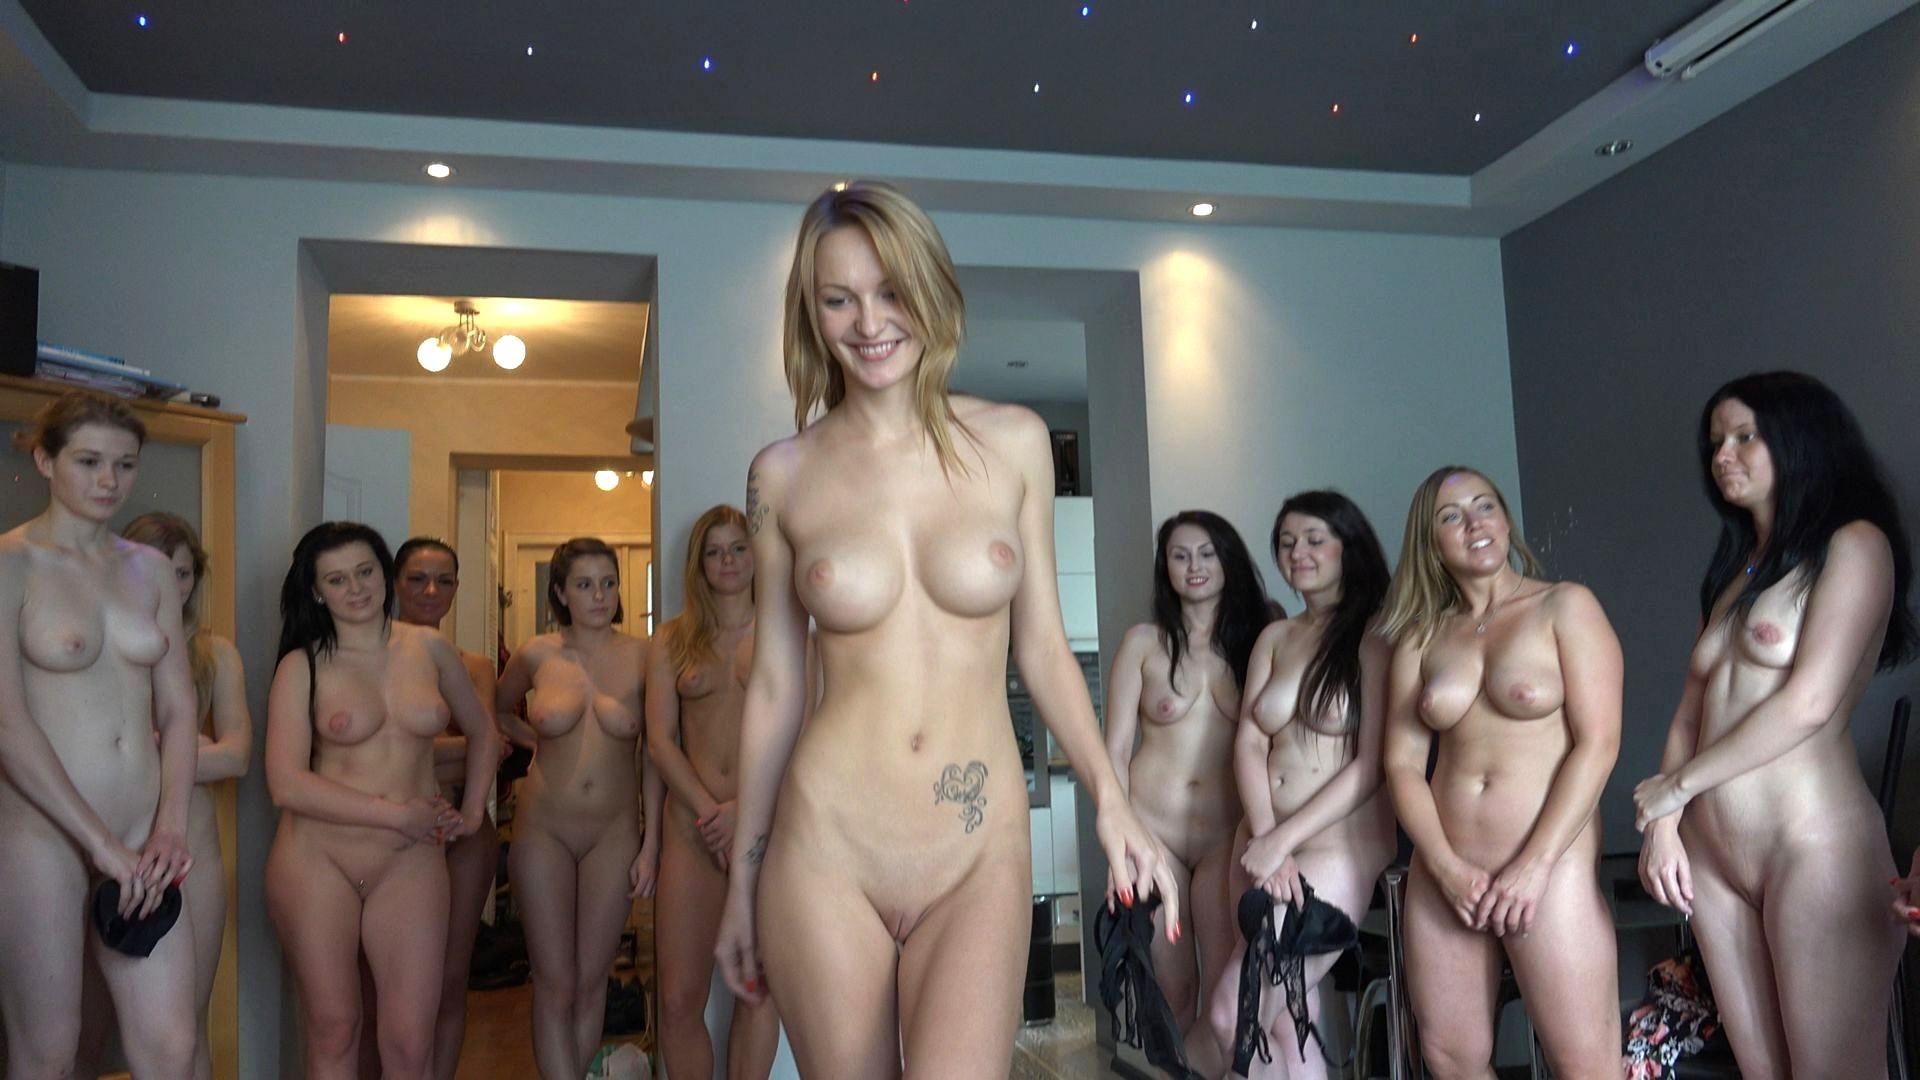 kastingi-russkih-devushek-v-eroticheskih-filmah